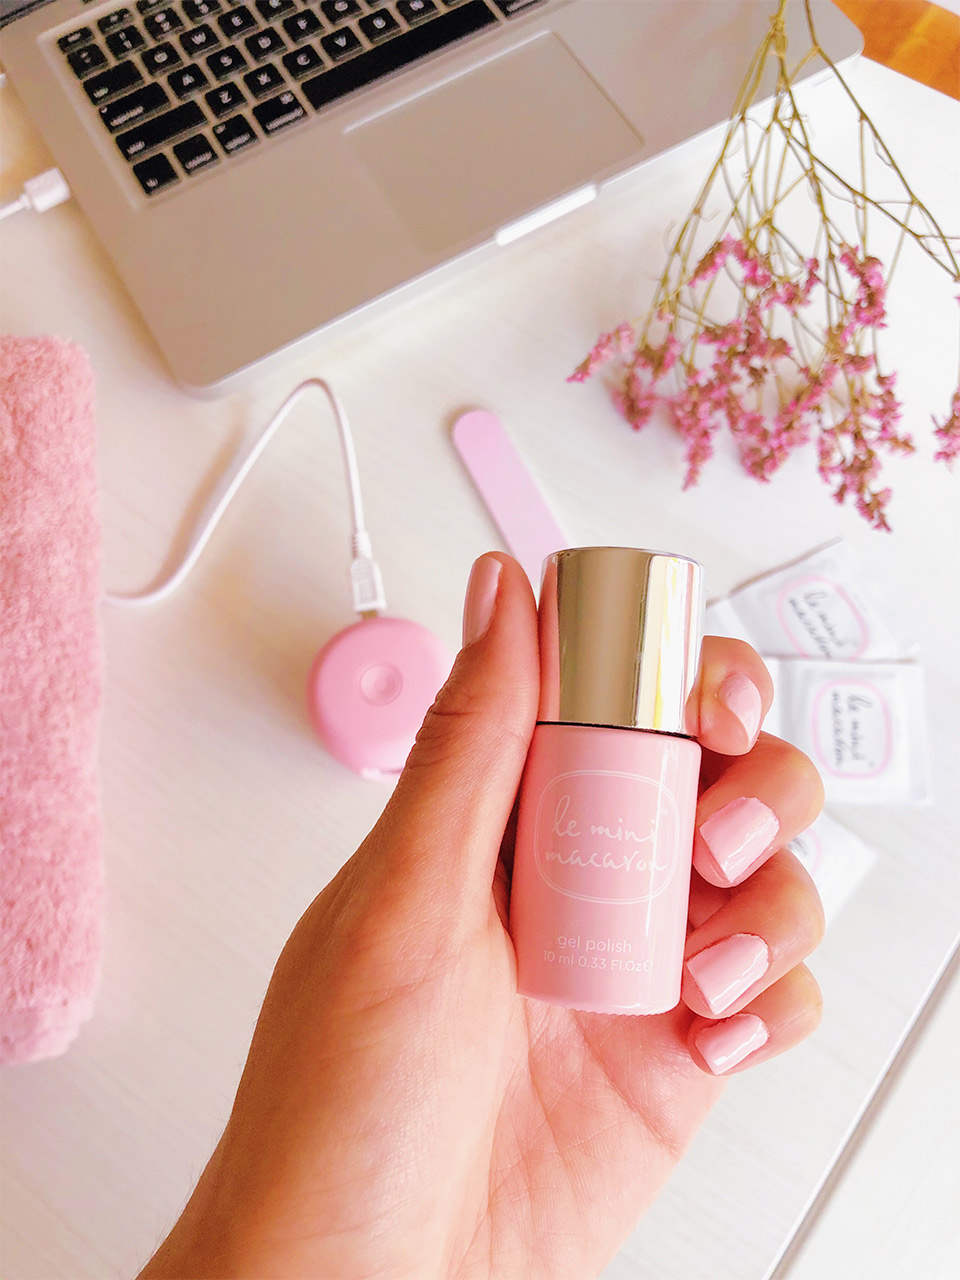 manicure-de-gel-en-casa-lampara-led-casera-para-manicura-le-mini-macaron-como-usarlo-review-le-mini-macaron-como-hacer-manicura-de-gel